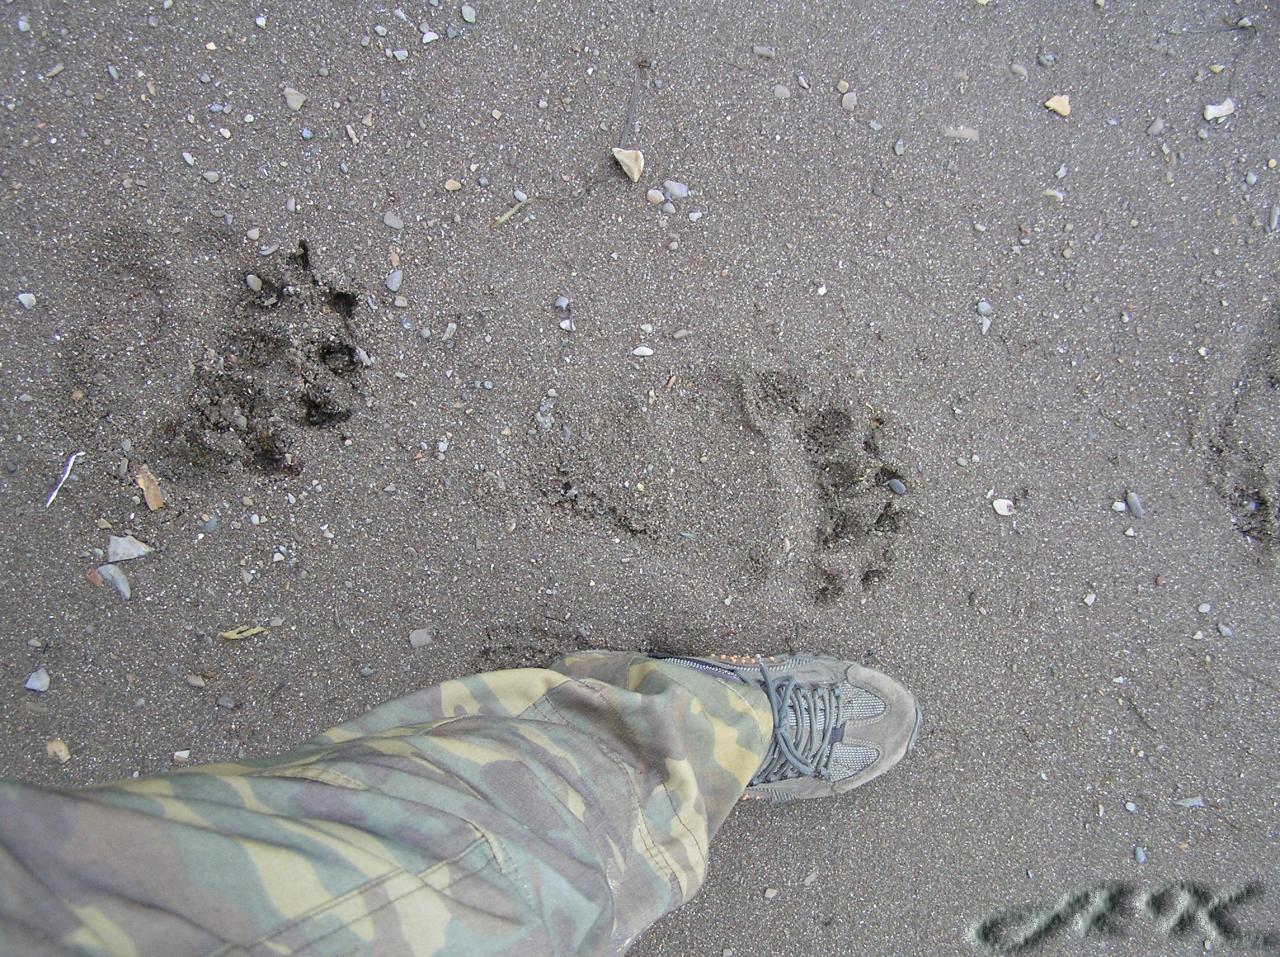 sakh-wolf: Один размерчик!